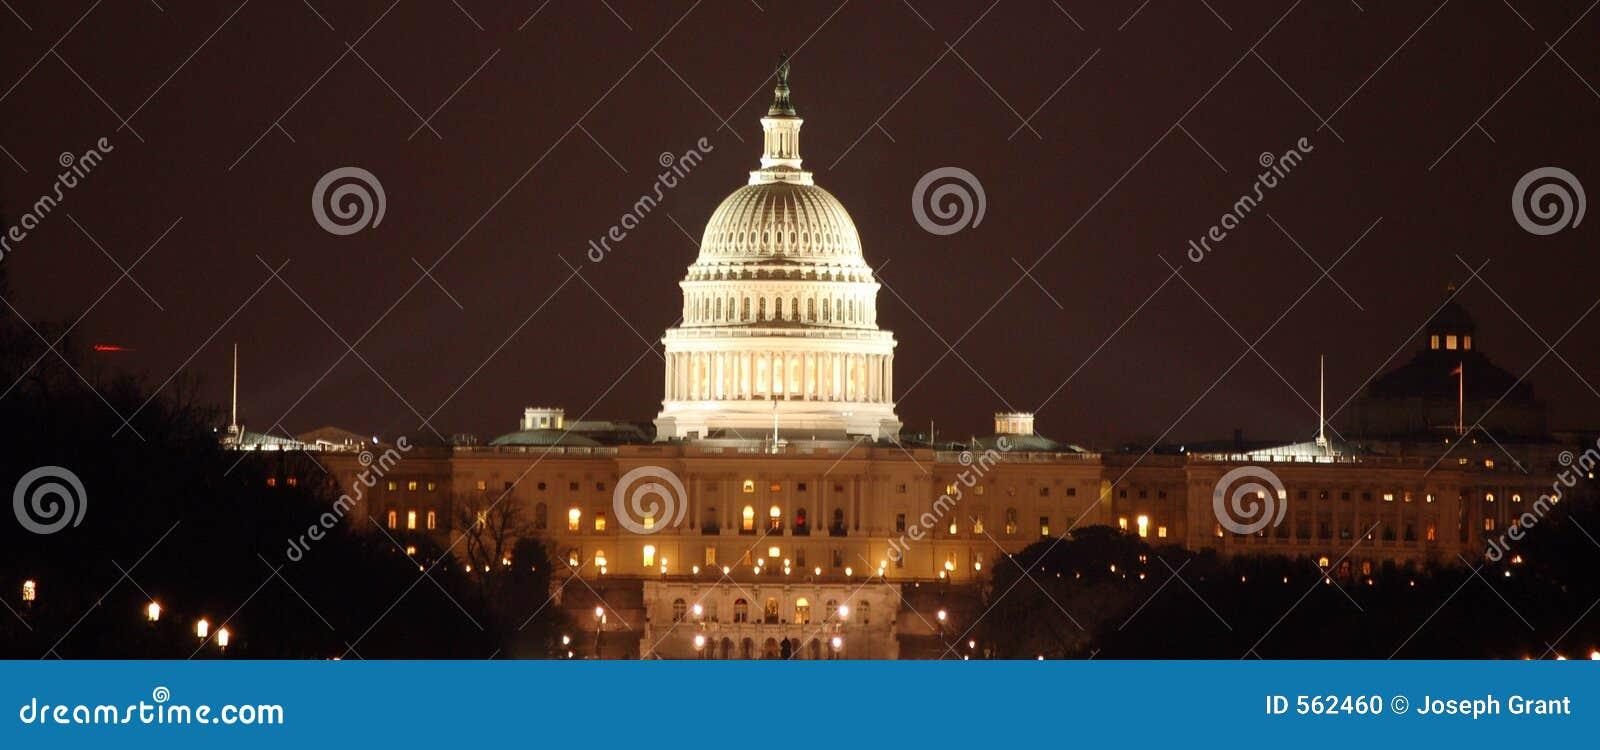 DC Capital at Night